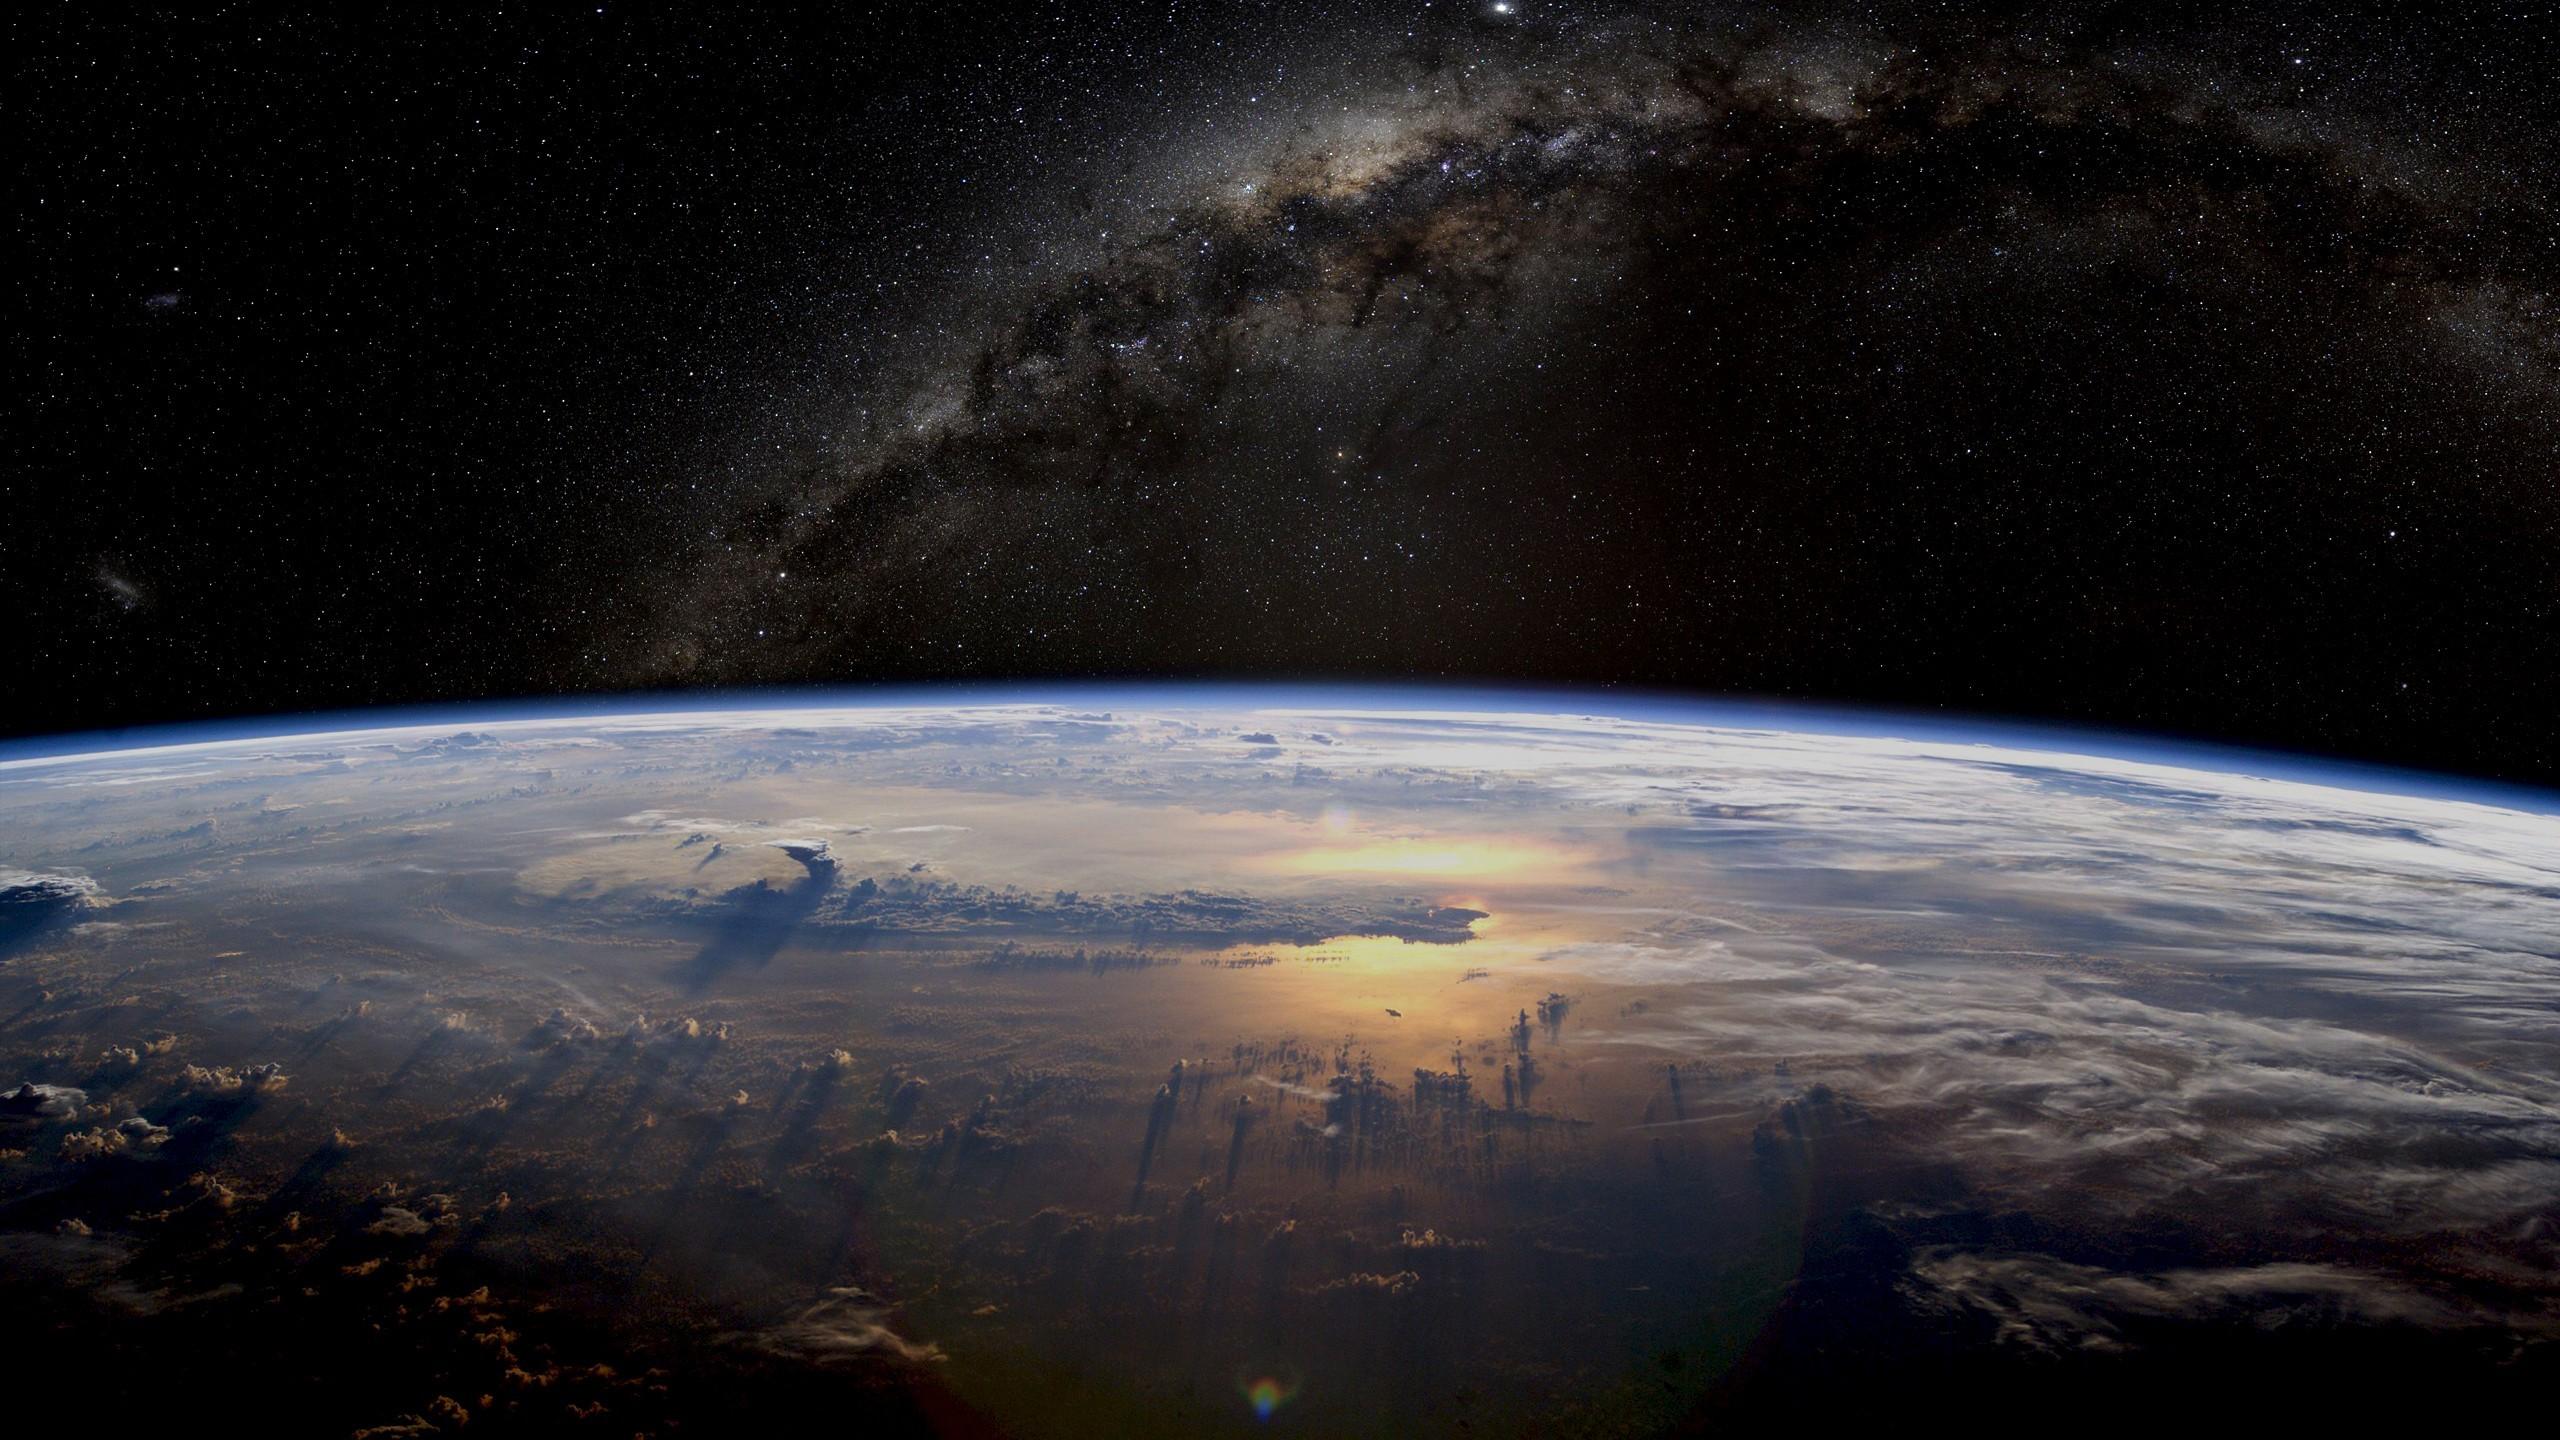 Fondos De Pantalla : Arte Digital, Noche, Galaxia, Planeta